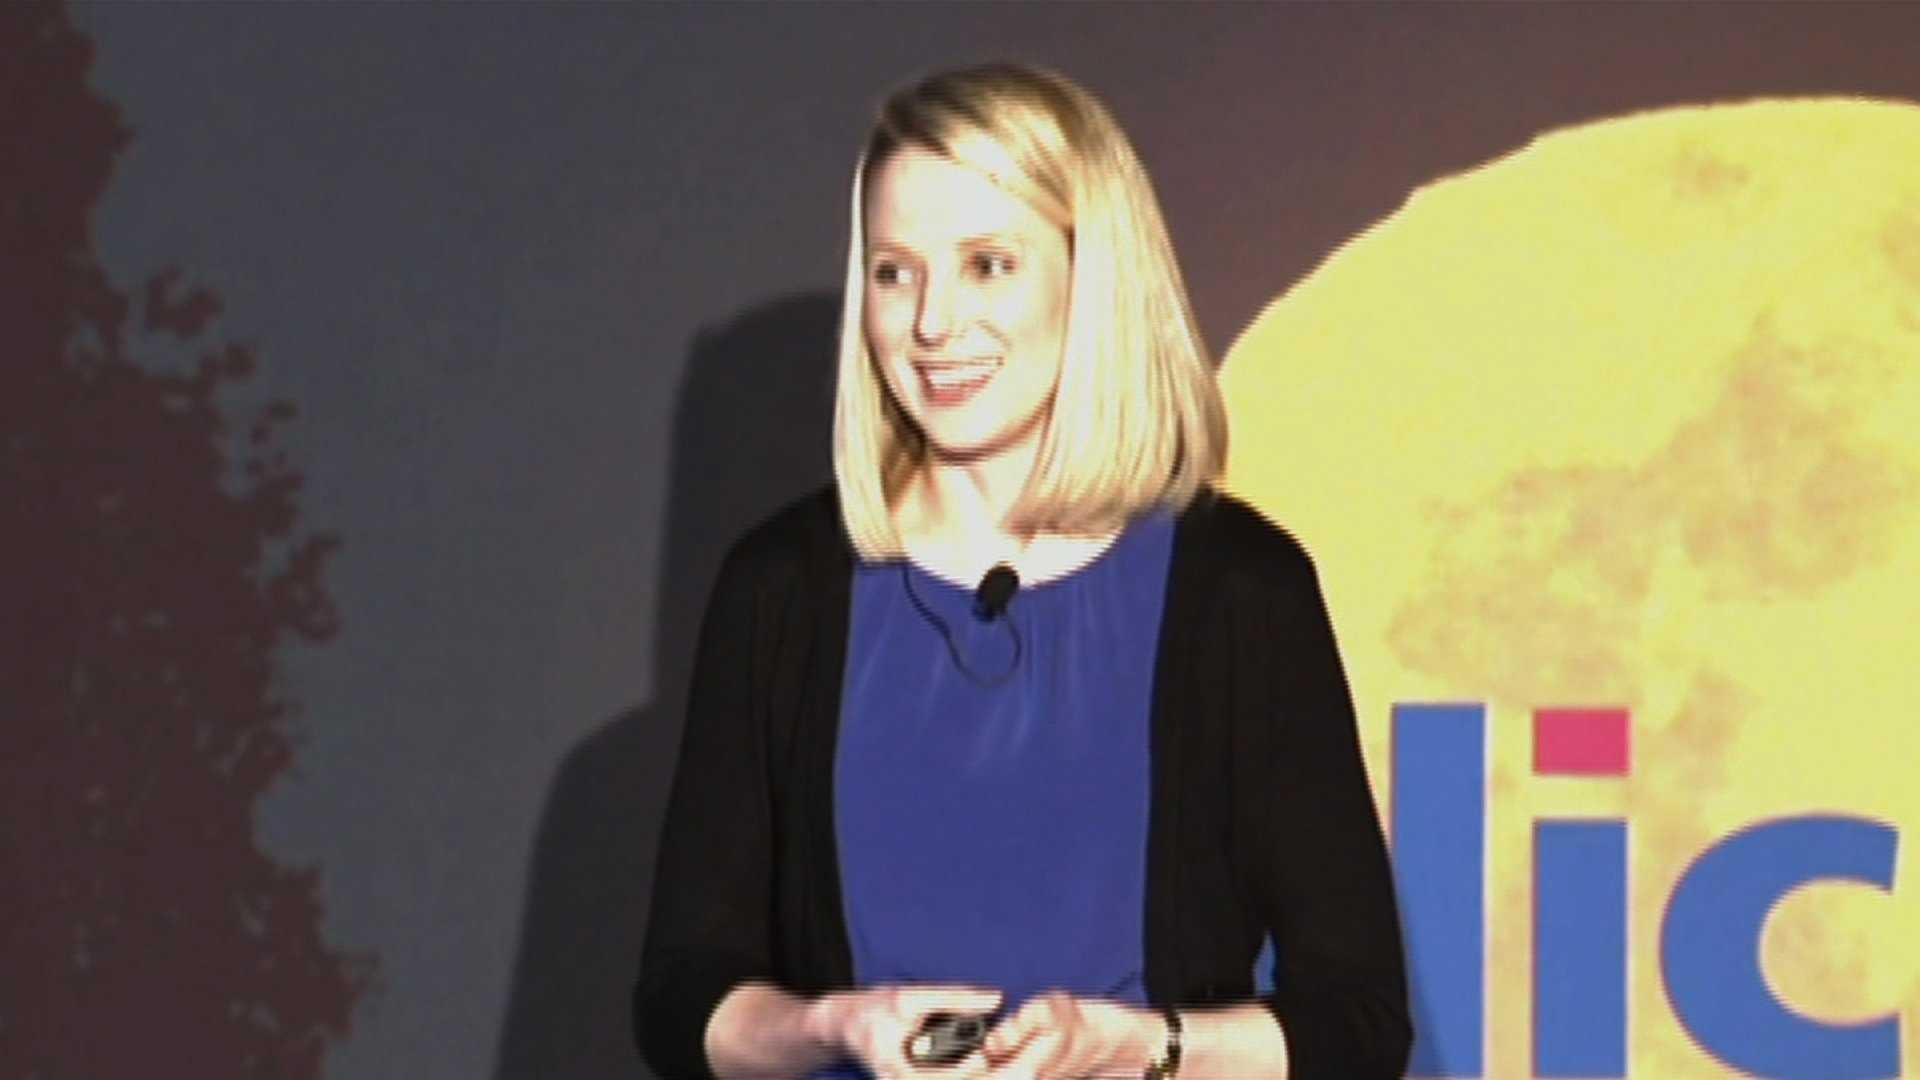 Yahoo CEO Marissa Mayer to get $23 million severance